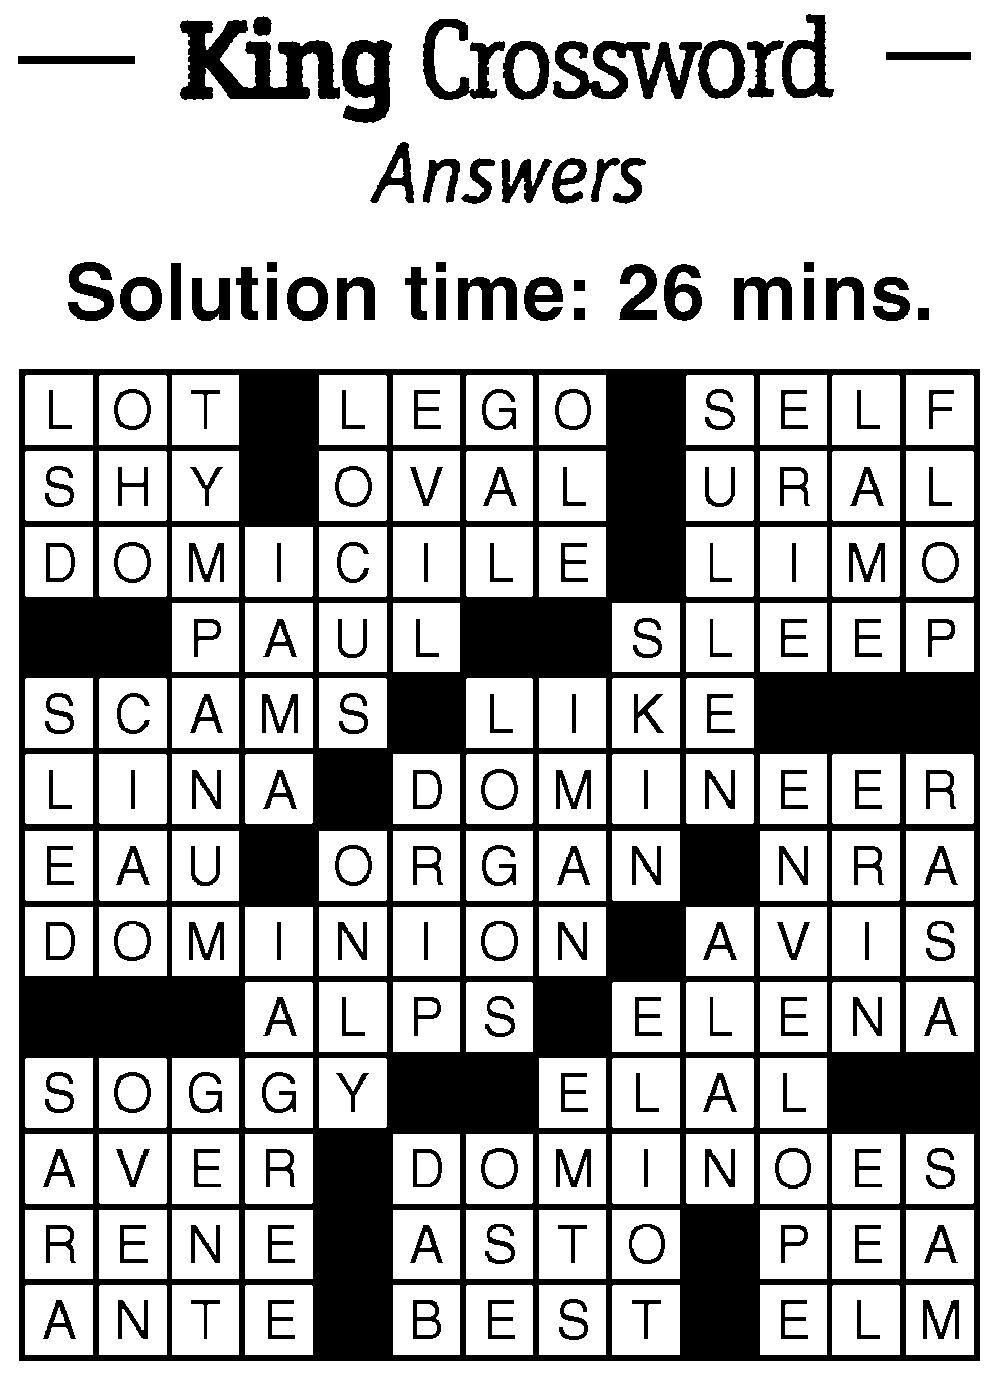 7/9 Crossword Answer